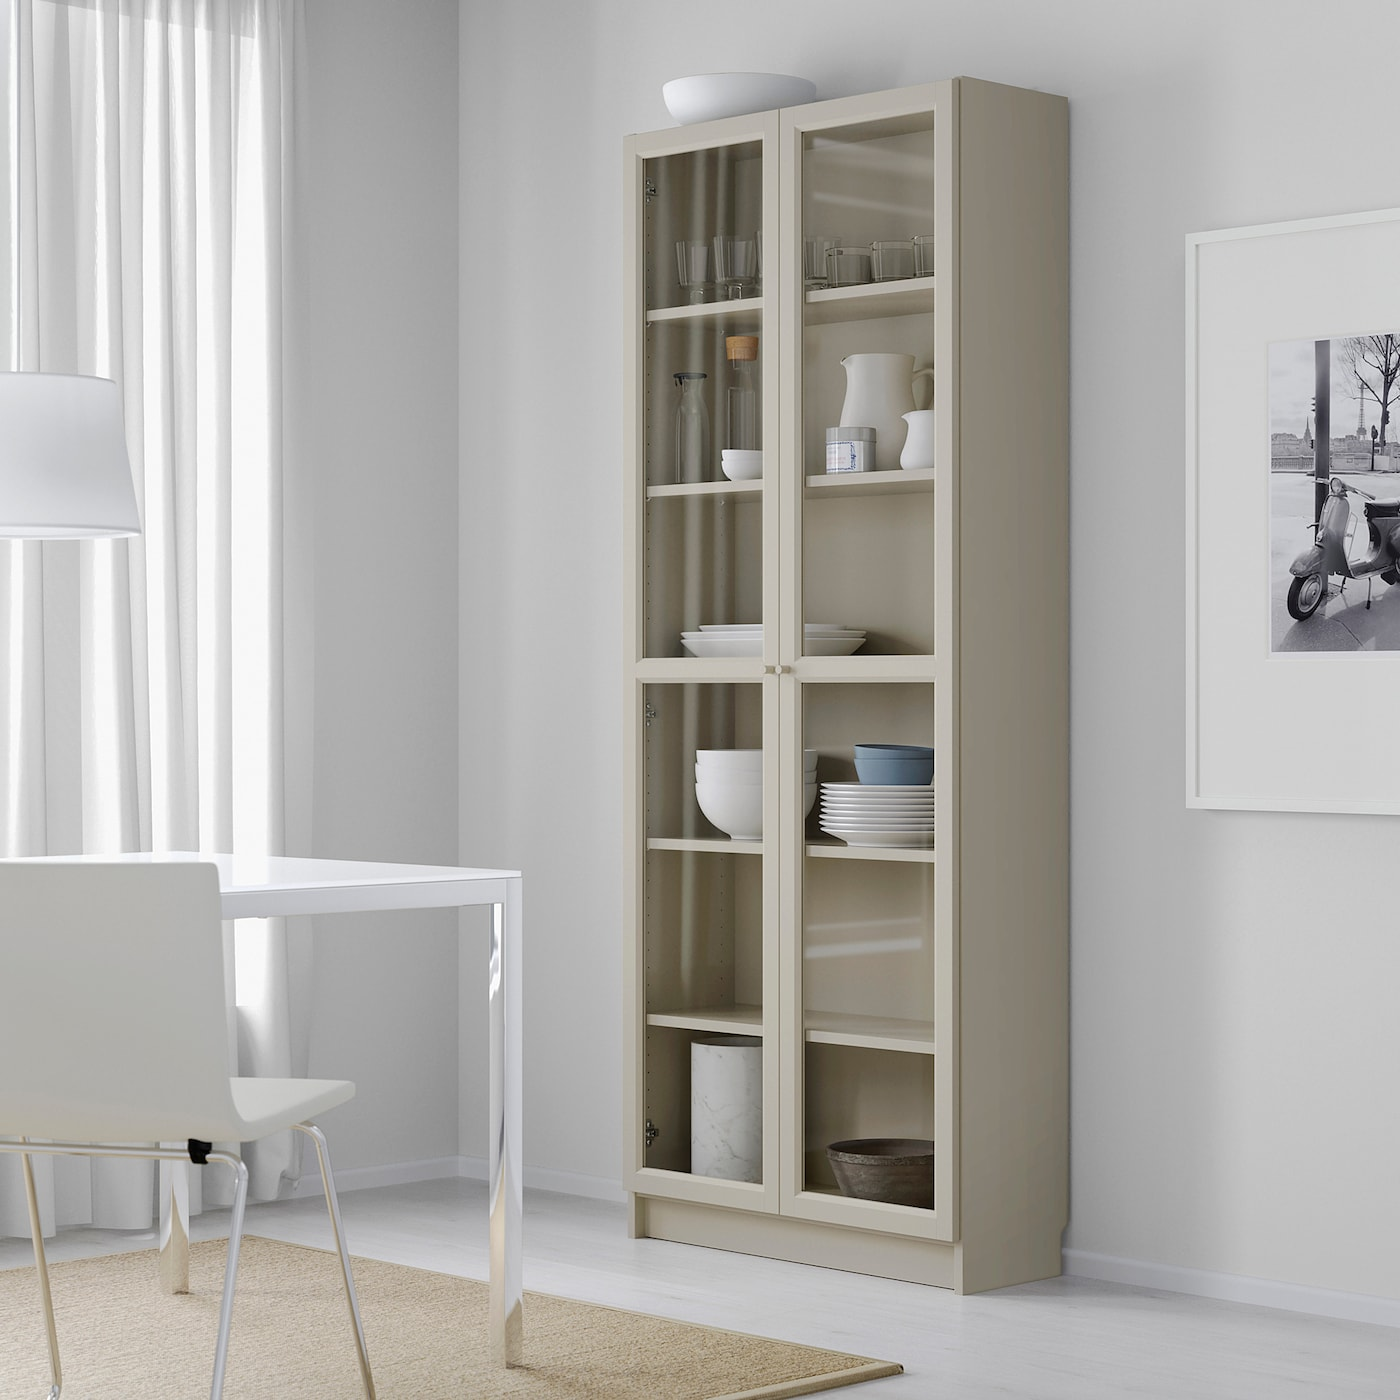 ikea cheap bookshelf image